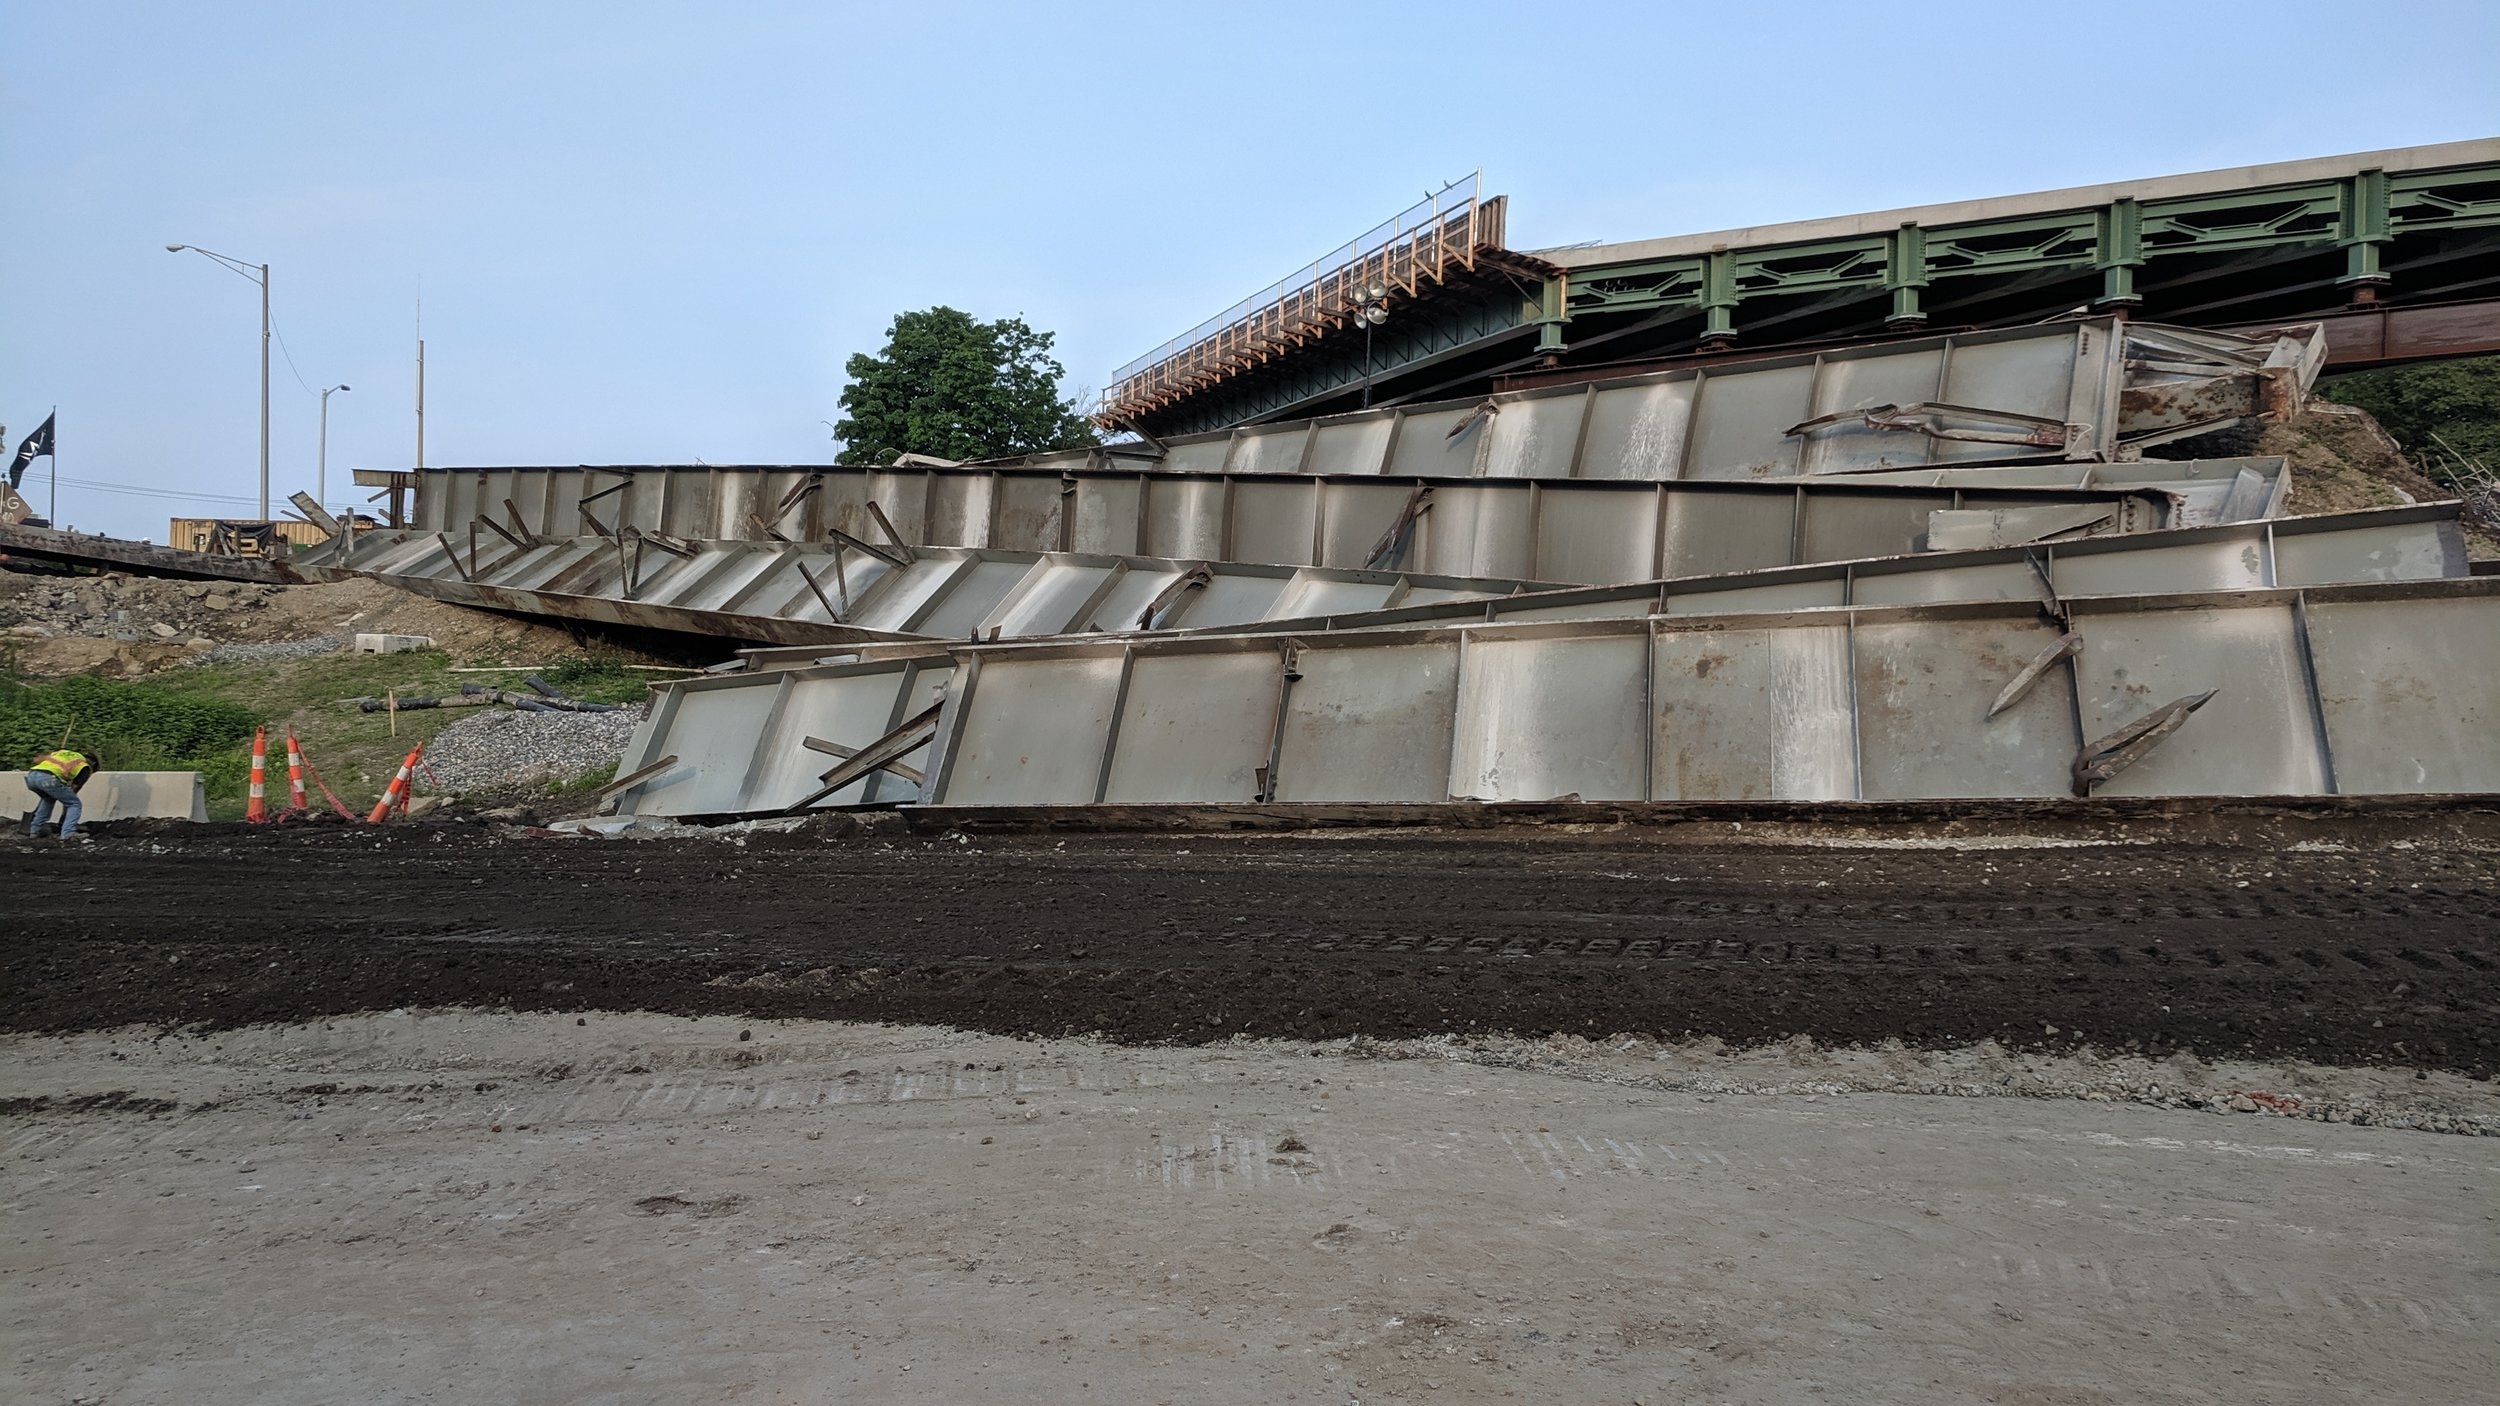 Steel girders from old bridge span await recycling.  Taken on afternoon of 6/2/19 by Jonathan Wu